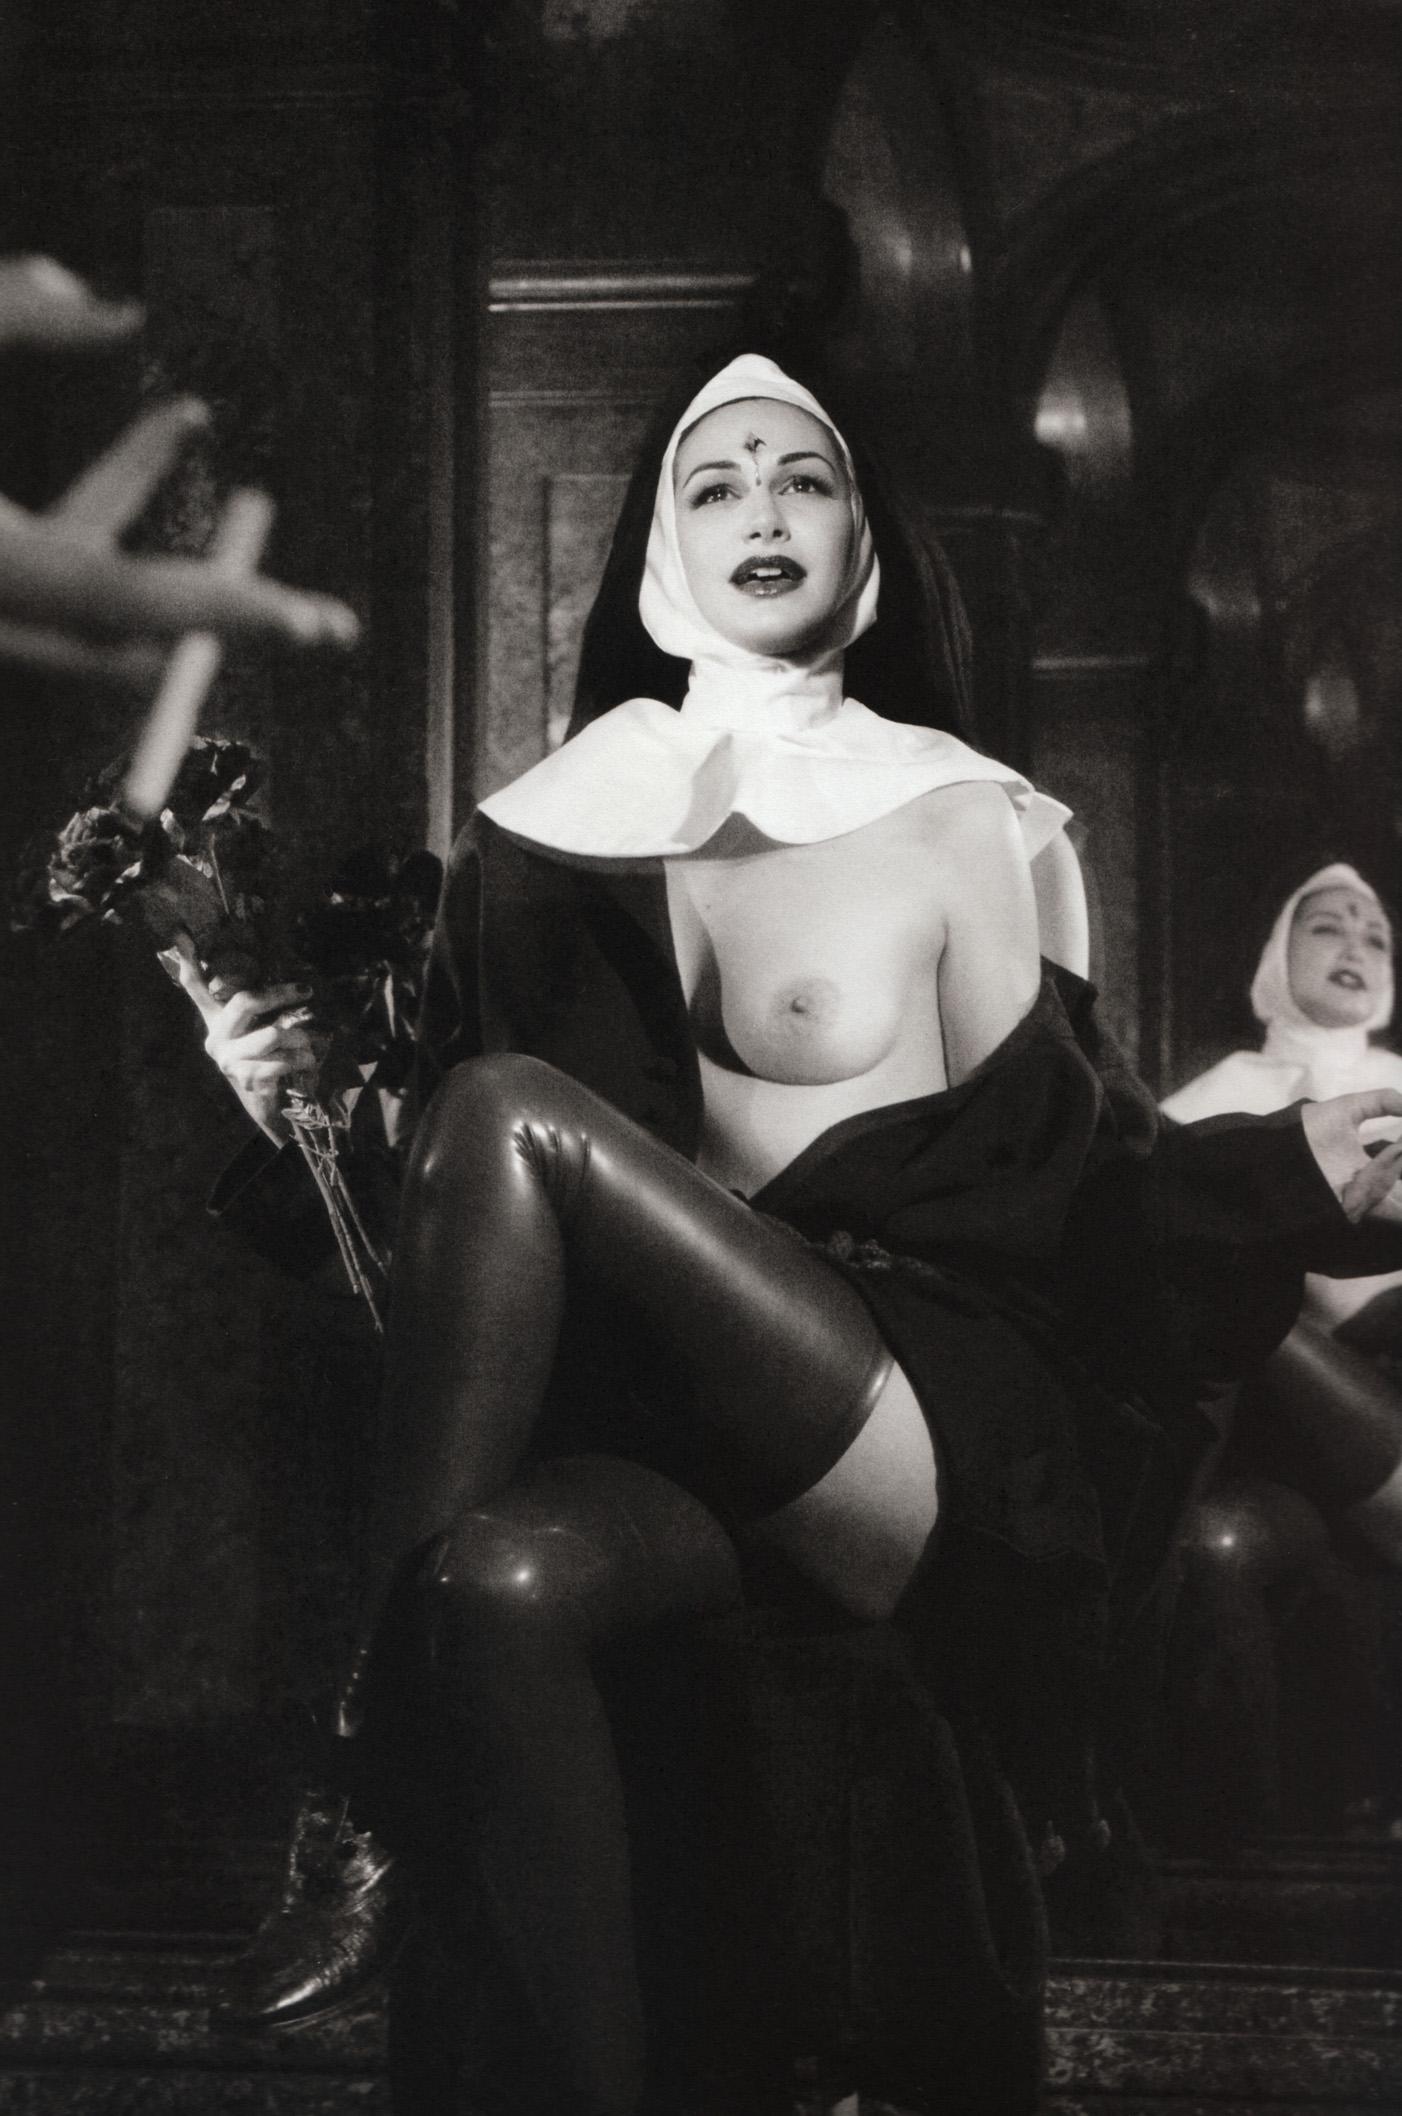 Free preist & nun sex pictures nude movies